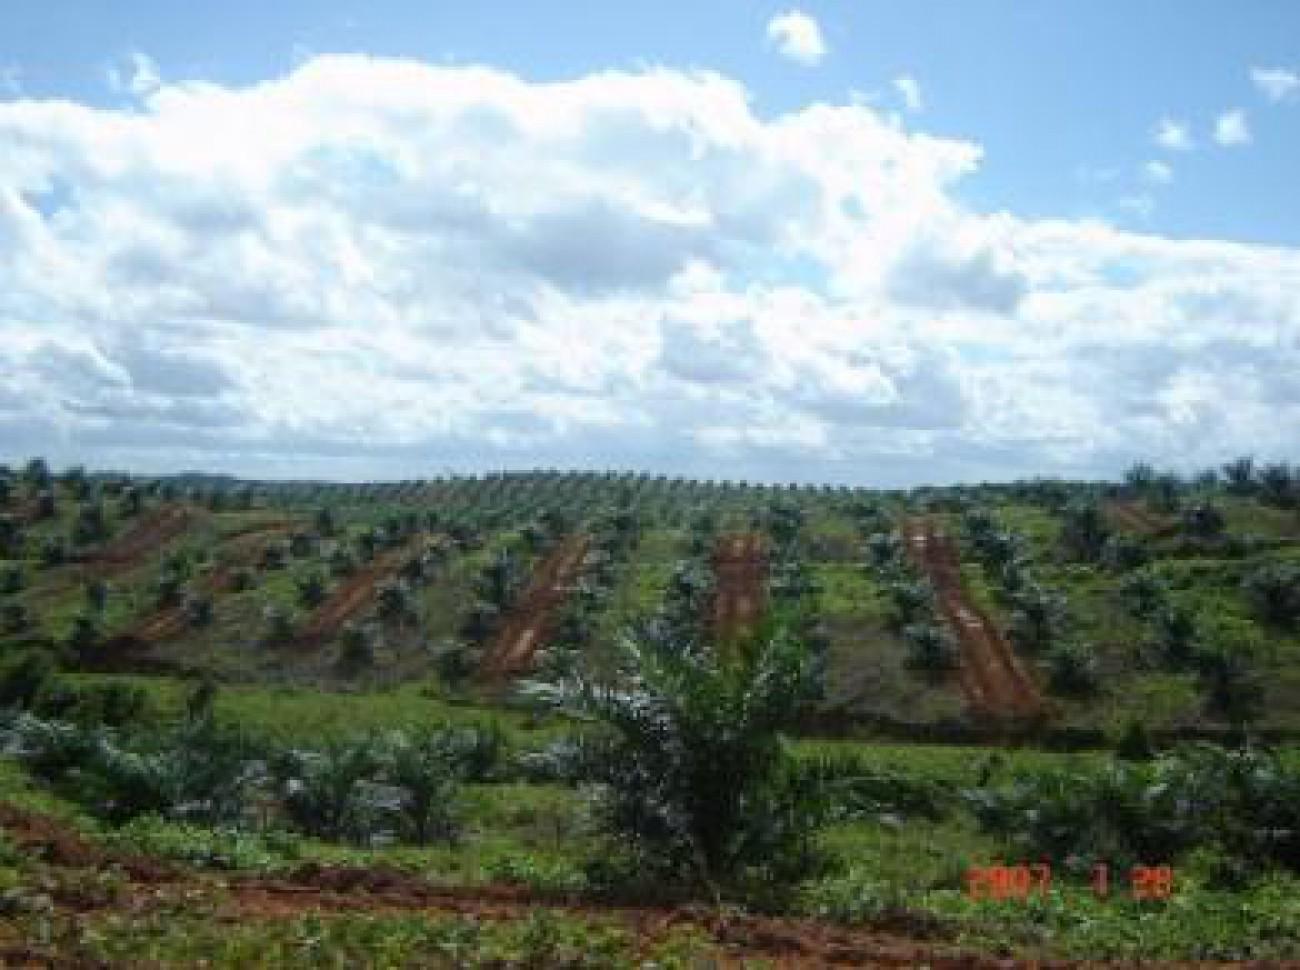 Pembangunan Perkebunan di Kutim Jalin Kemitraan dengan Masyarakat